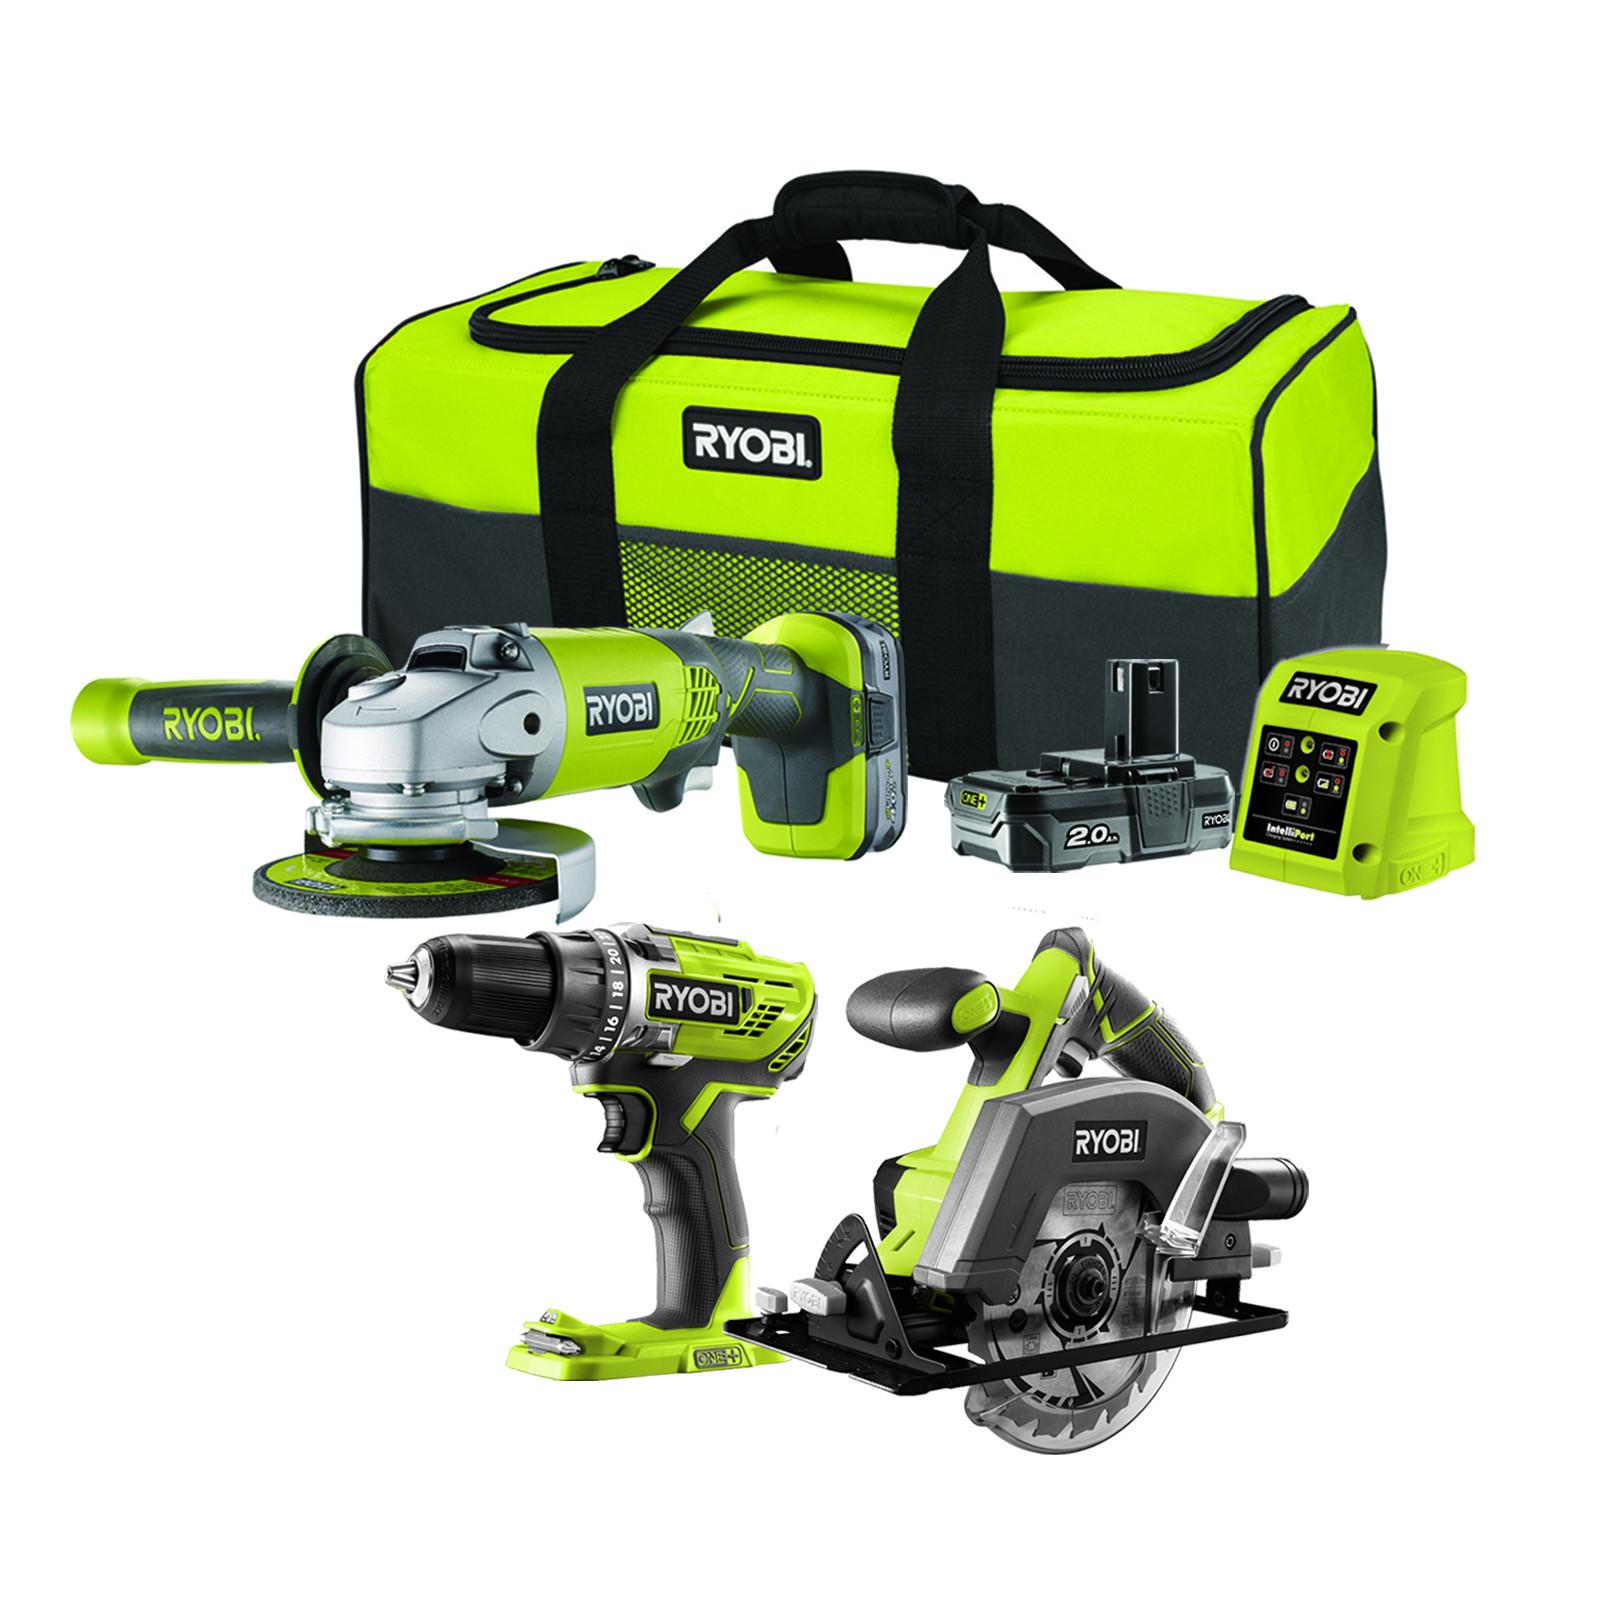 Ryobi R18PDAGCS-242S 18V ONE+ Cordless Combi Drill, Circular Saw & Angle Grinder Starter Kit - £169.15 delivered @ Homebase